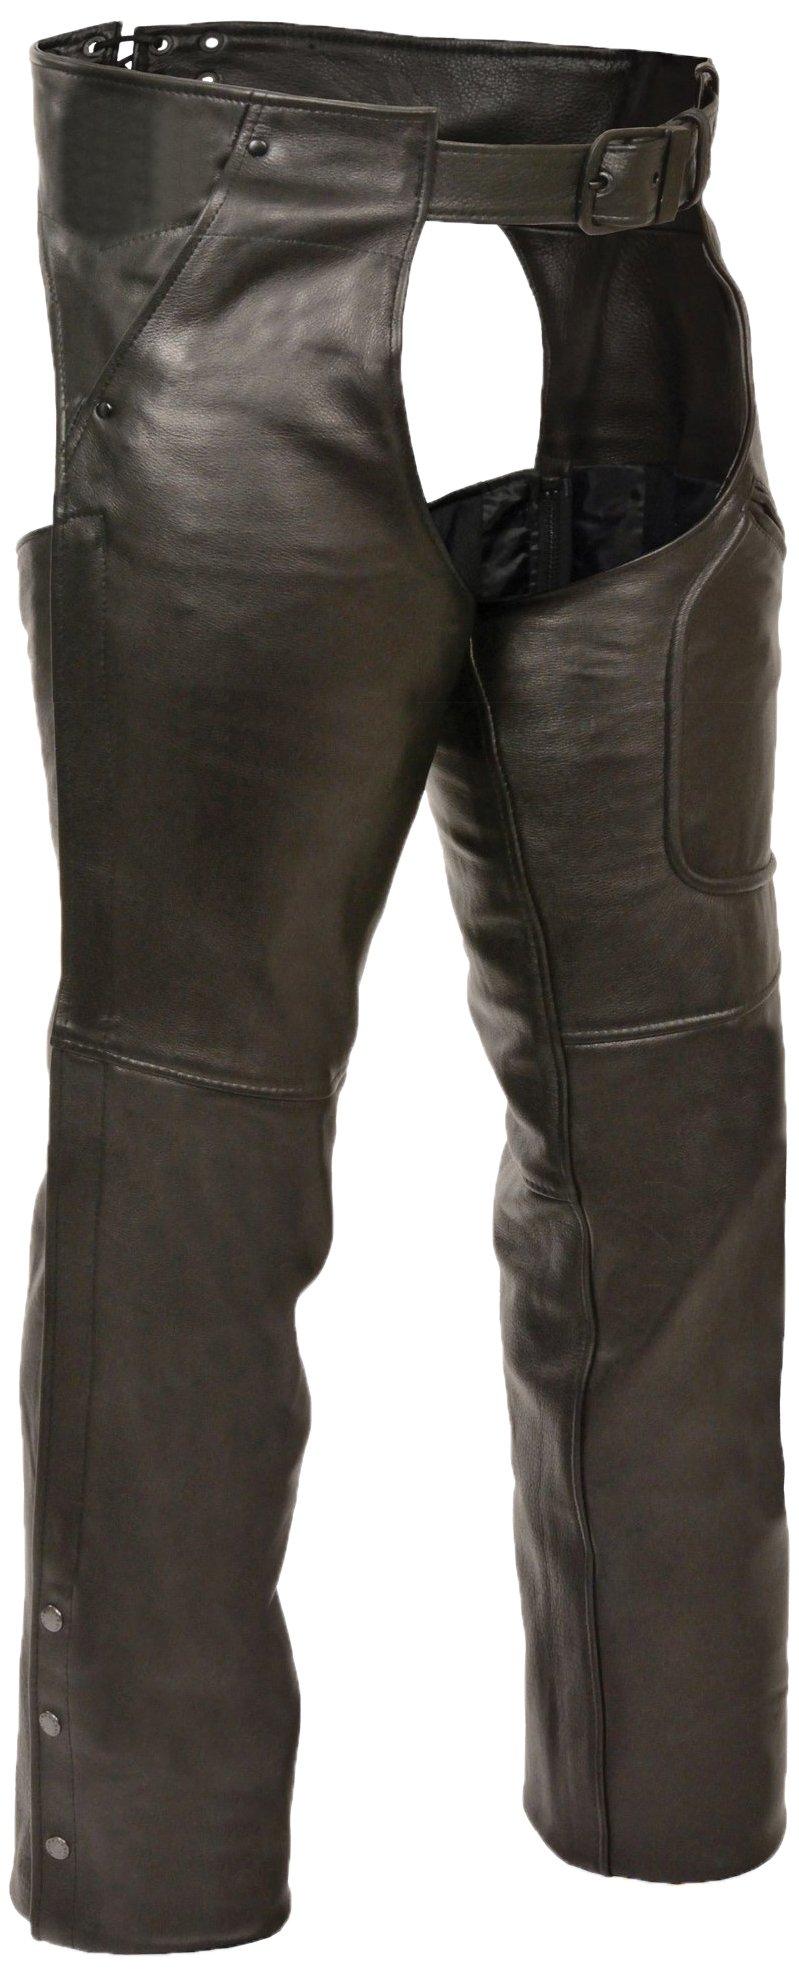 Milwaukee Premium Buffalo Deep Skin Leather 3 Pocket Chaps (Black, X-Small)